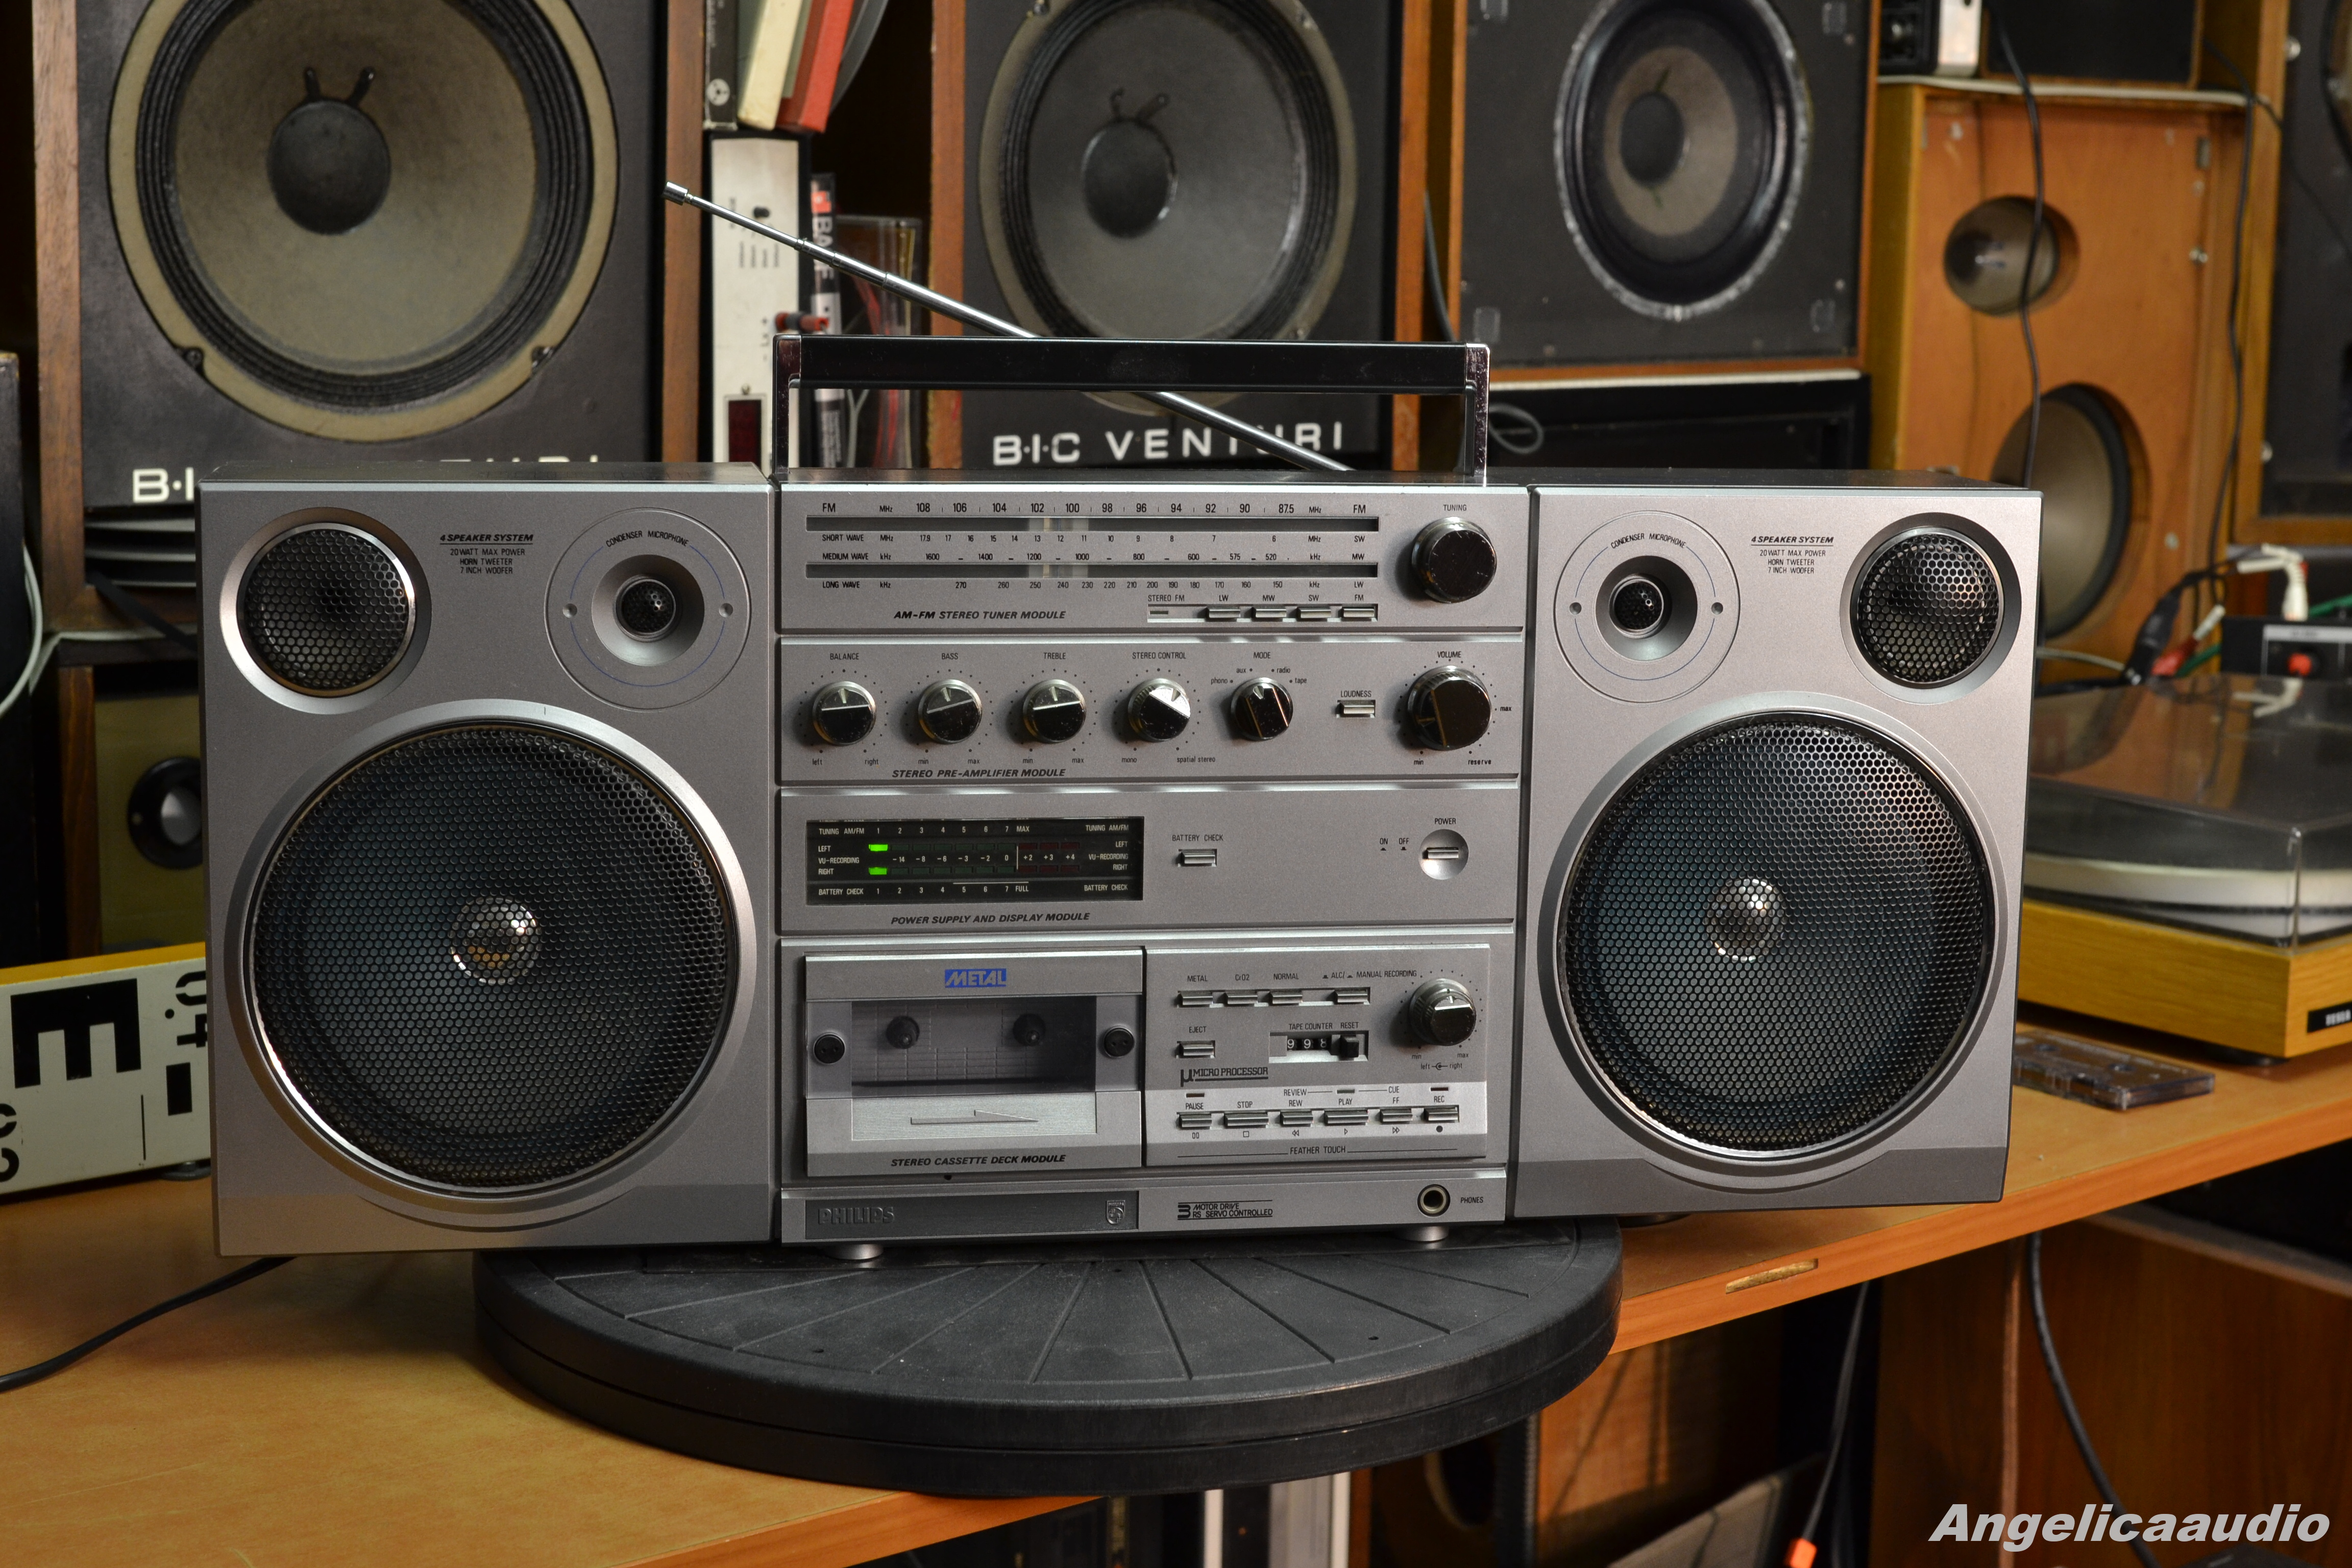 Philips D8614 « Angelicaaudio 1990 42a6c38dac1